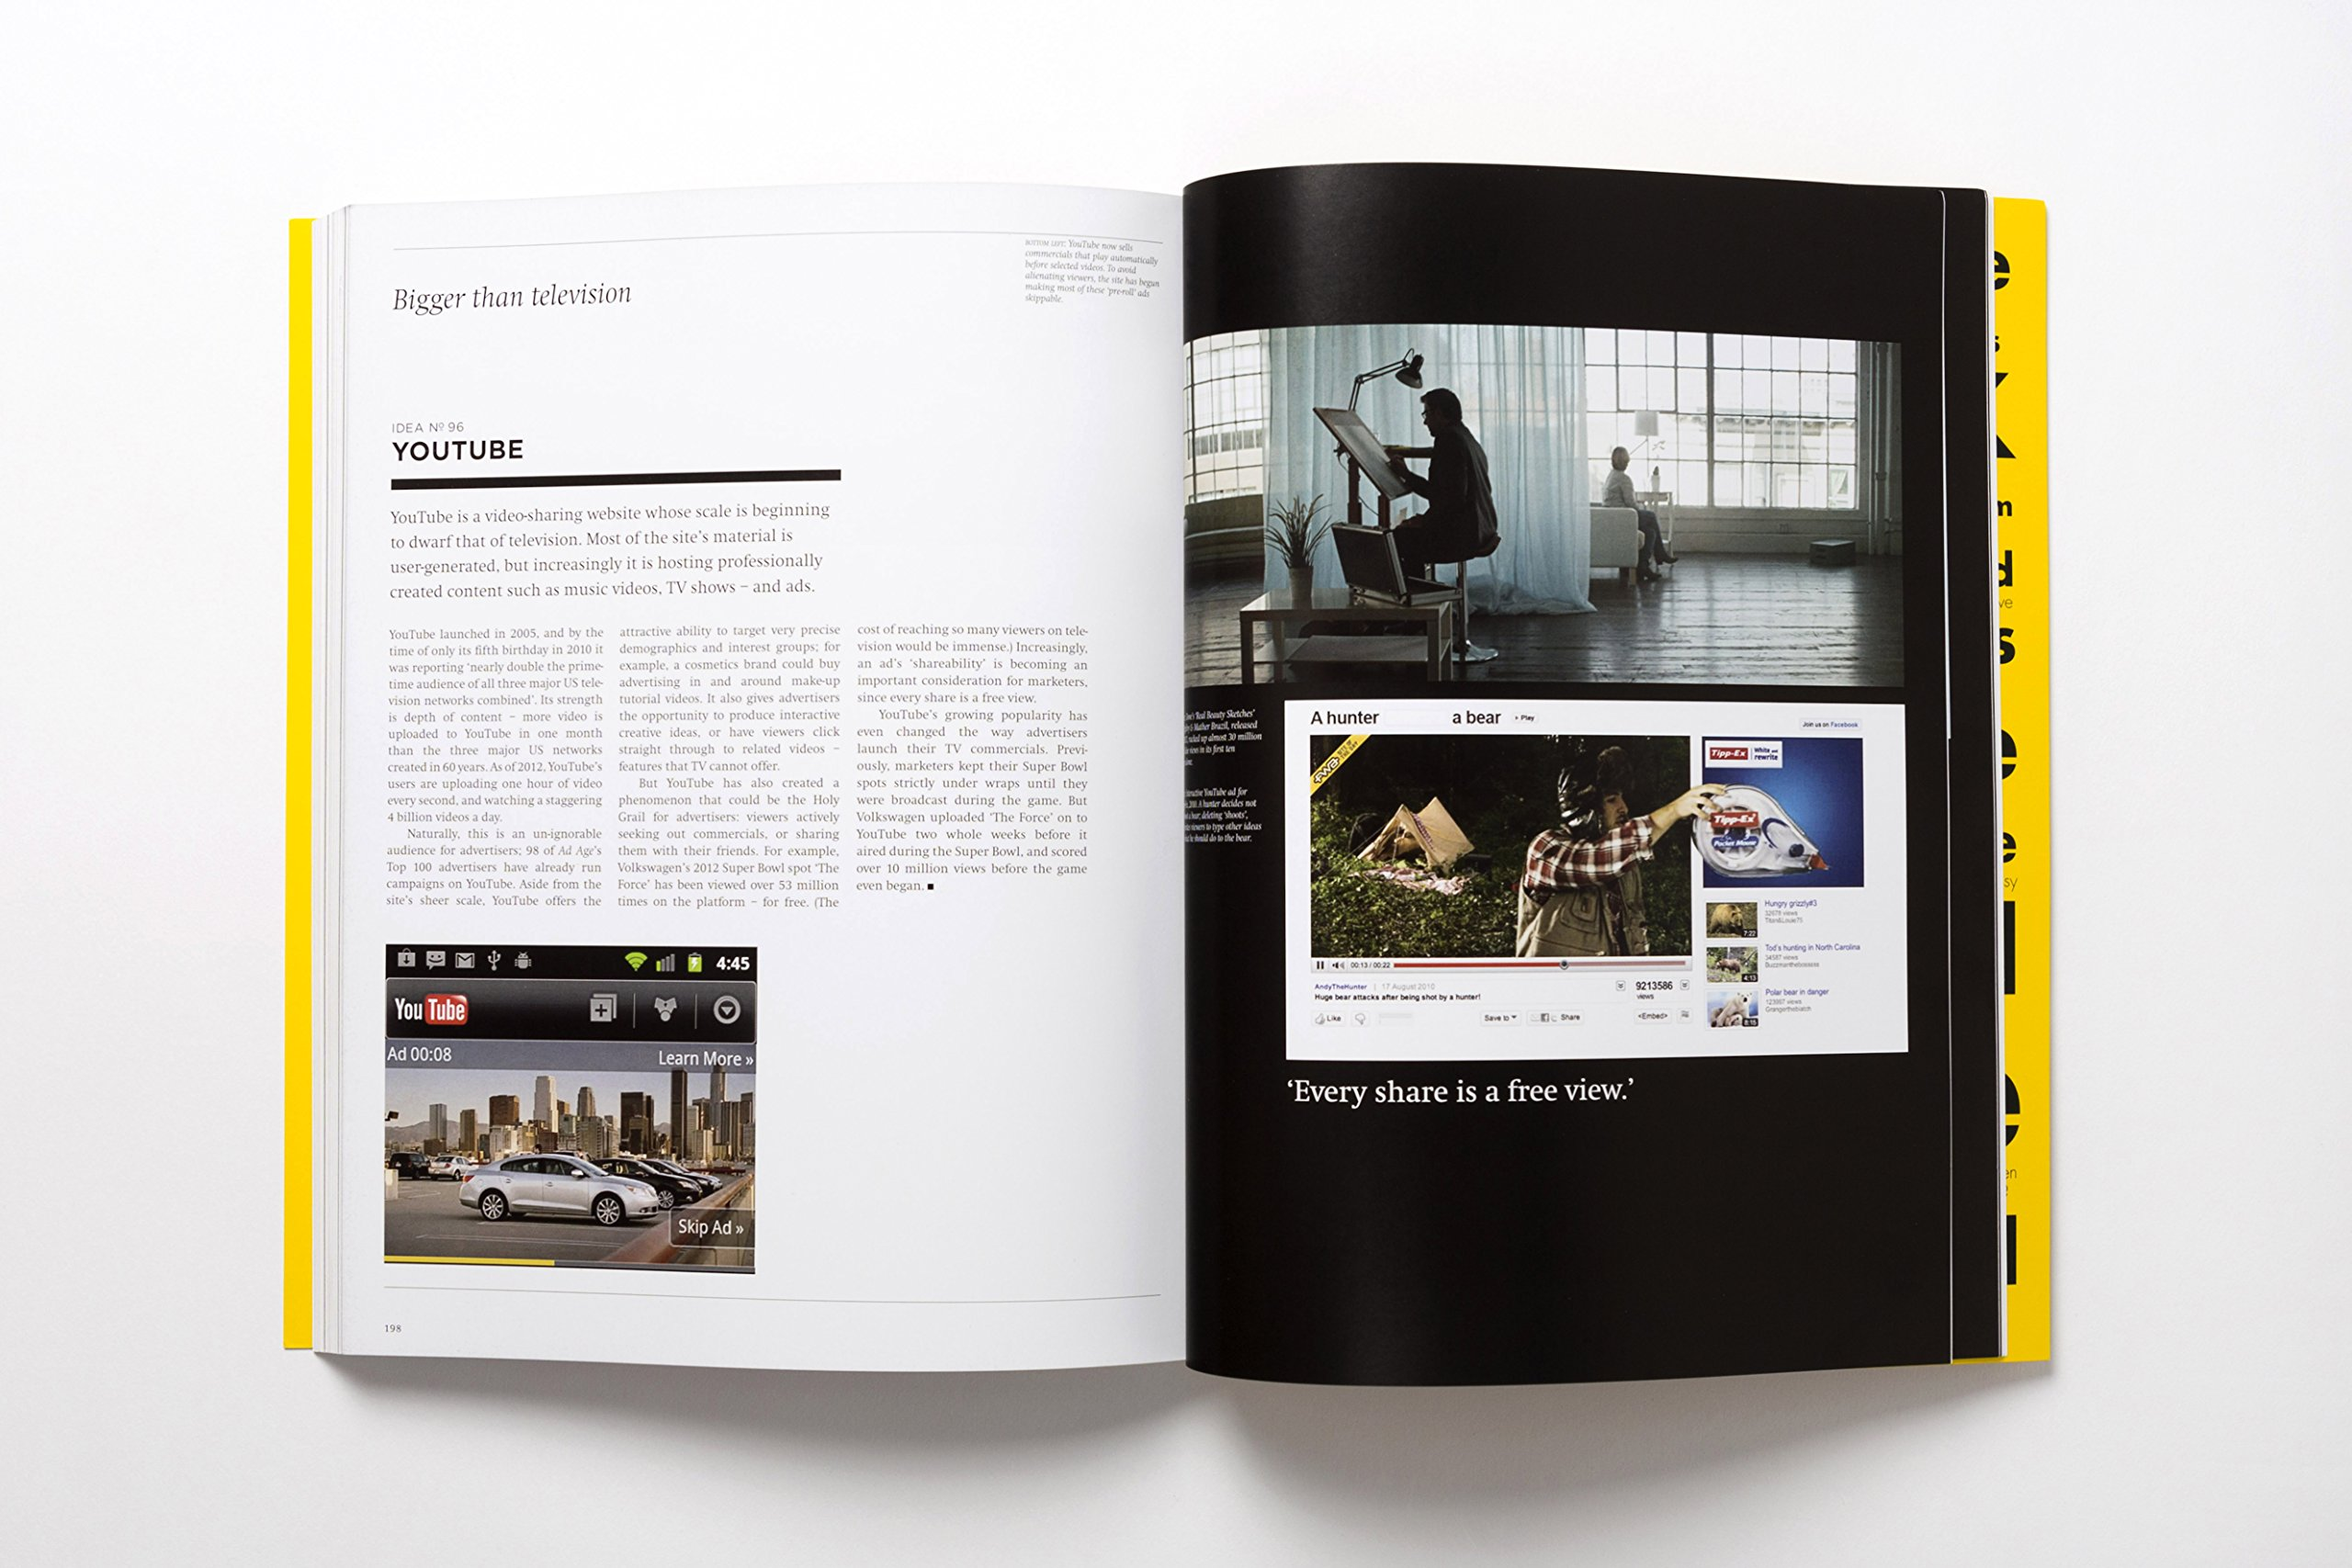 100 Ideas that Changed Advertising: Simon Veksner: 9781780672342: Amazon.com:  Books